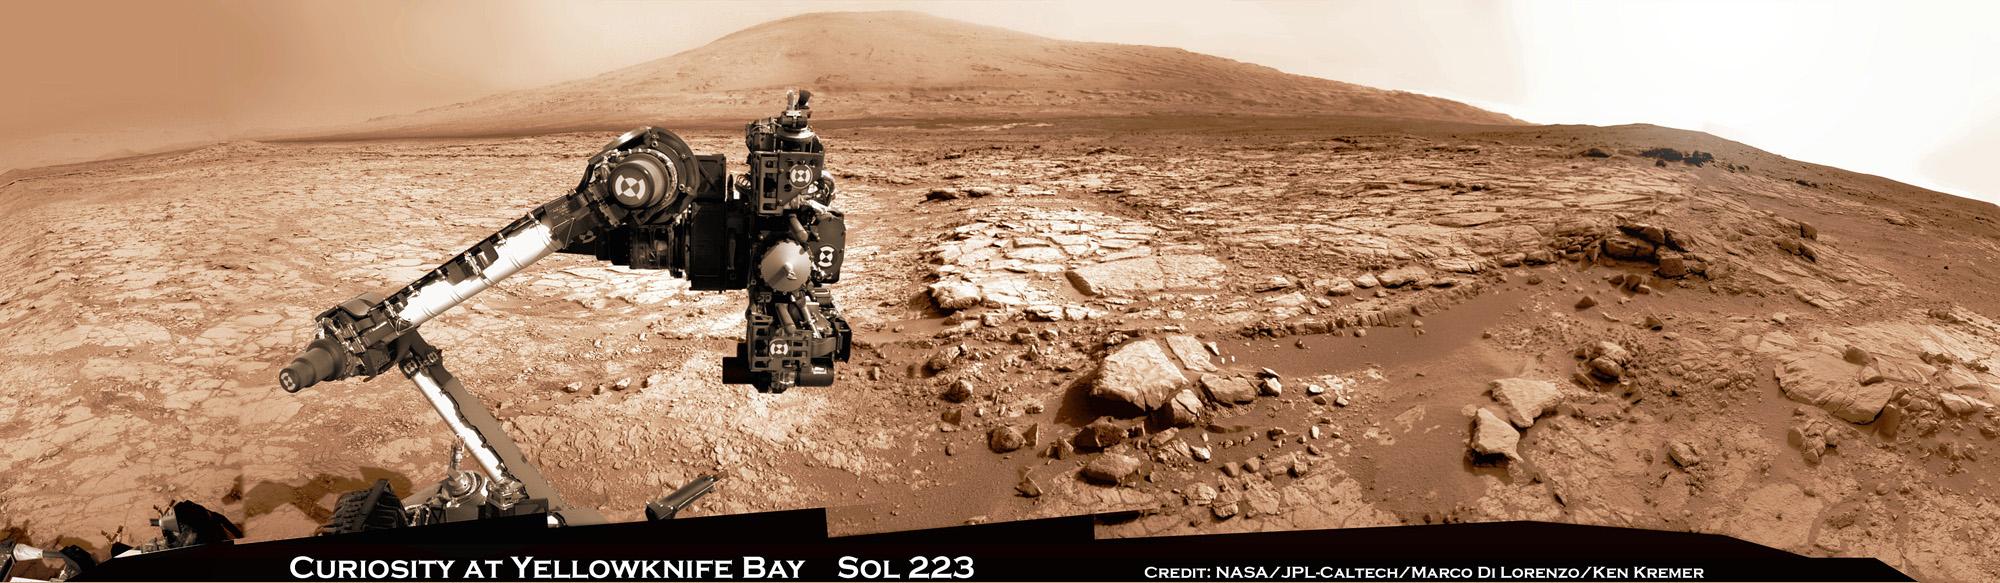 Curiosity Panorama at John Klein Drill Site